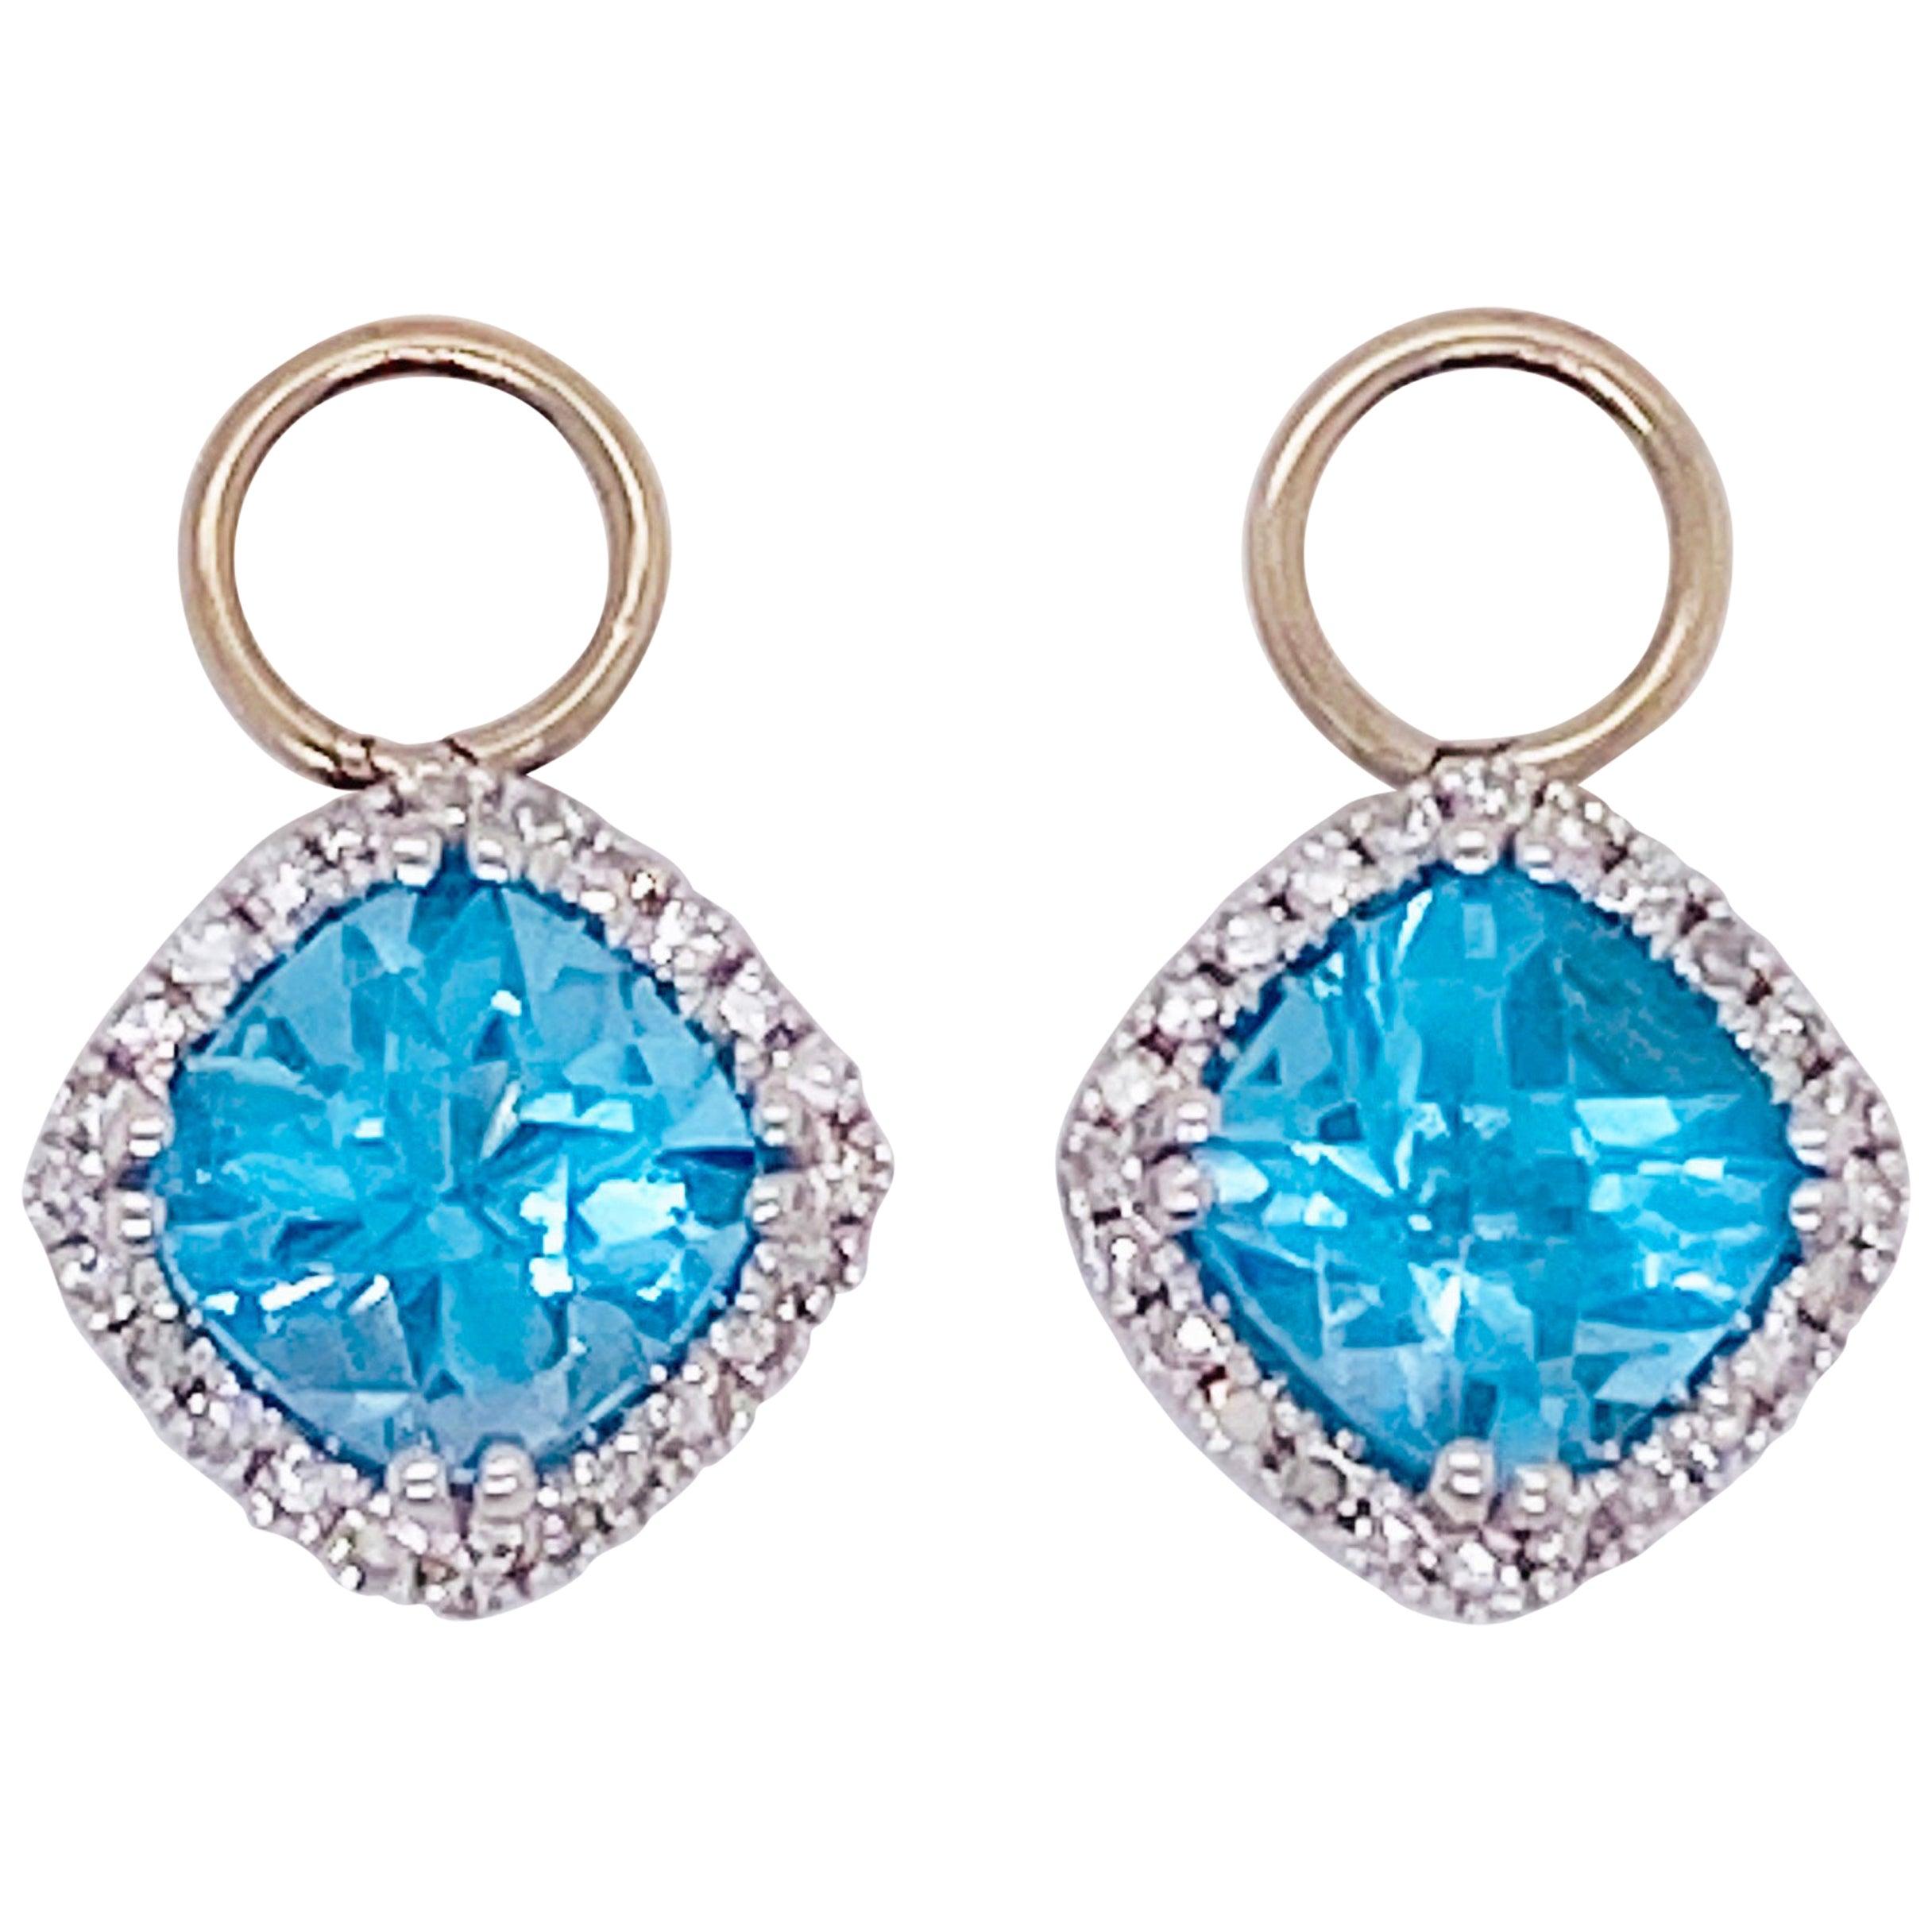 Blue Topaz & Diamond Halo Earring Charms 14 Karat Gold 1/2 Carat Hoop Charm Set